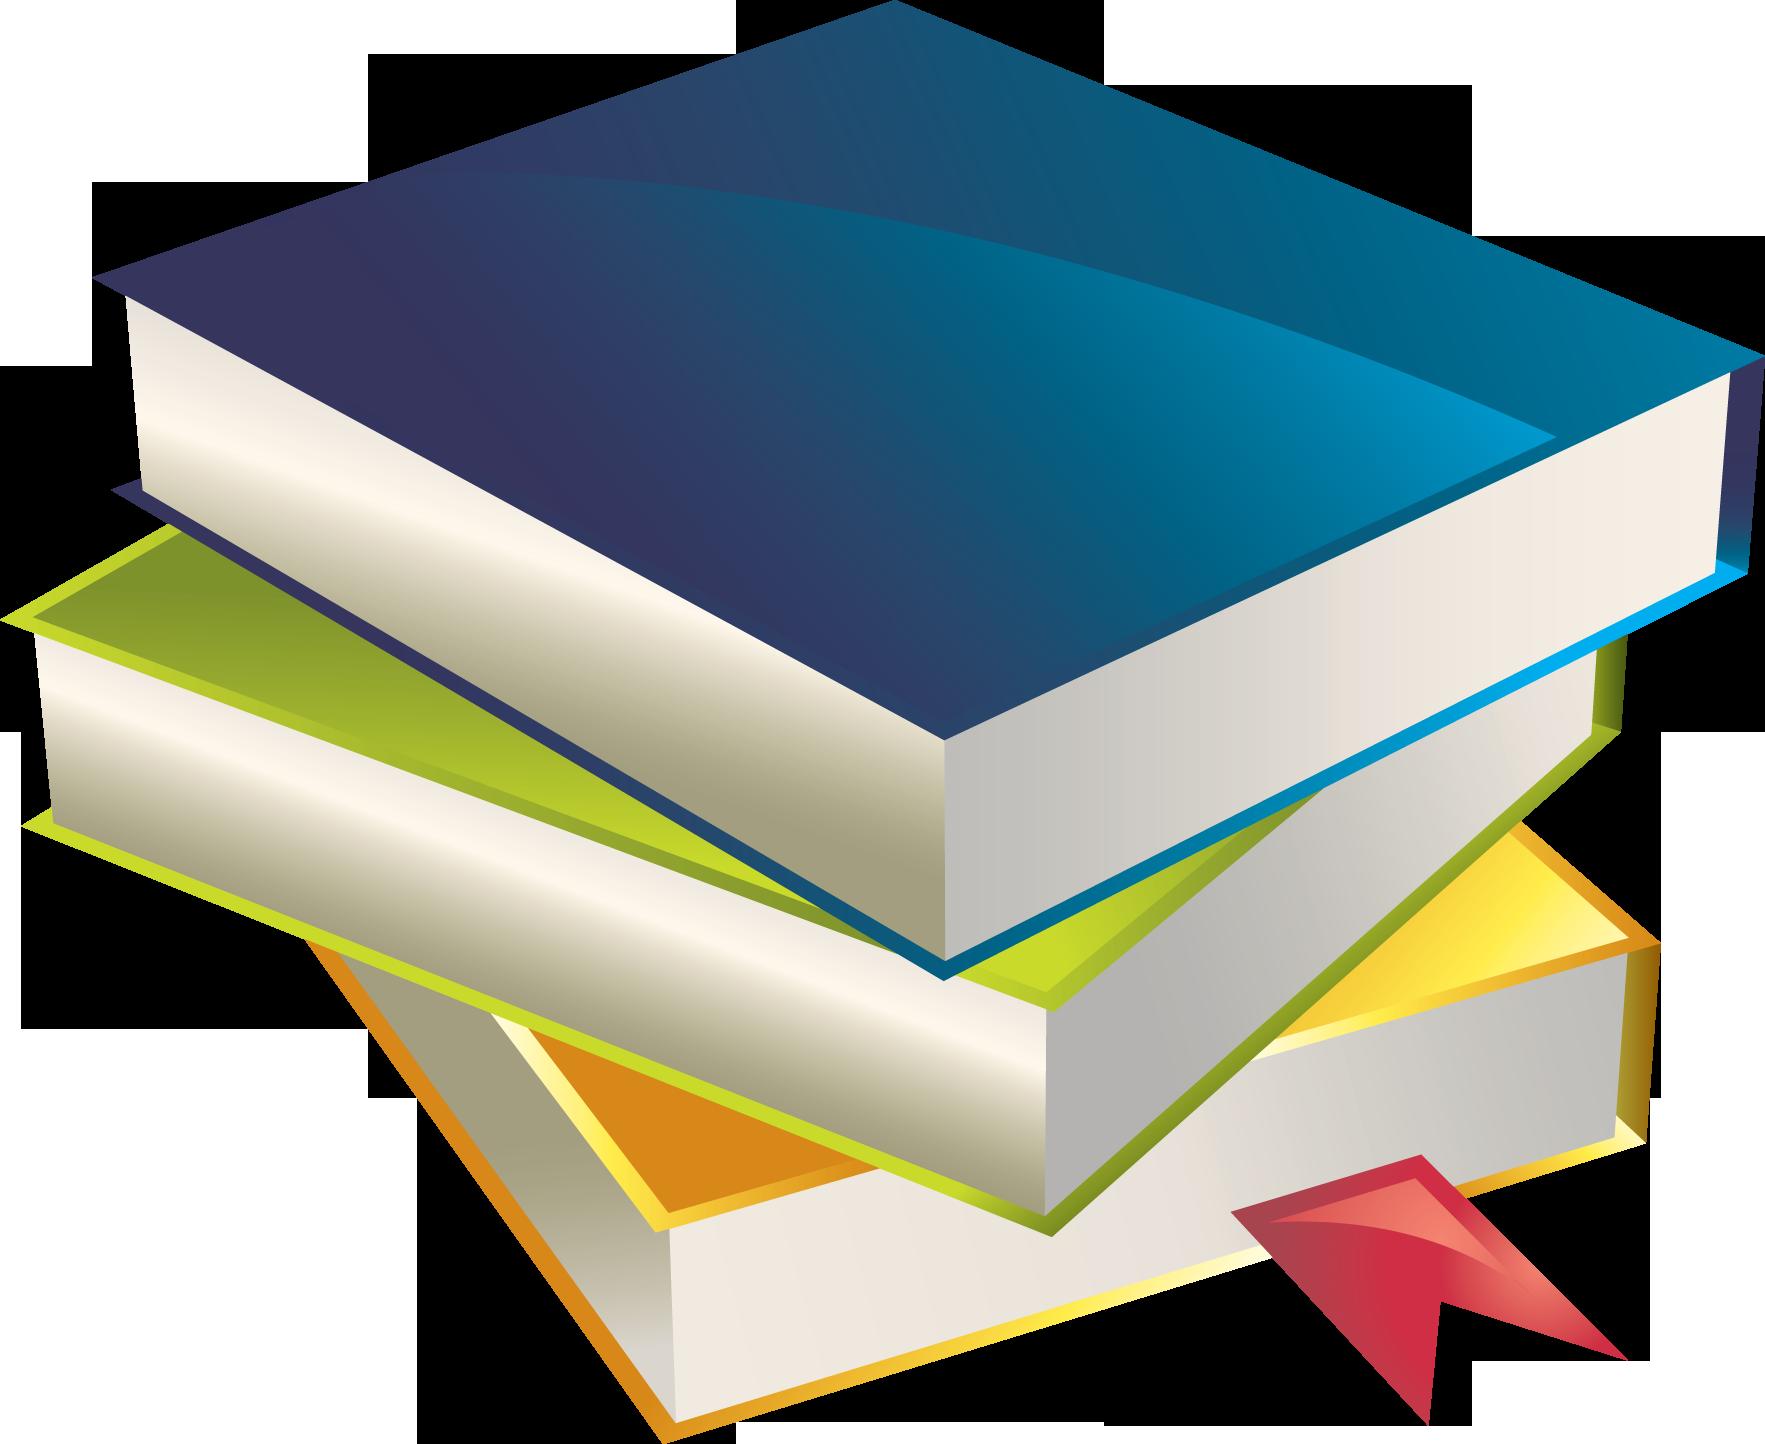 Book Transparent - 15312 - TransparentPNG black and white stock